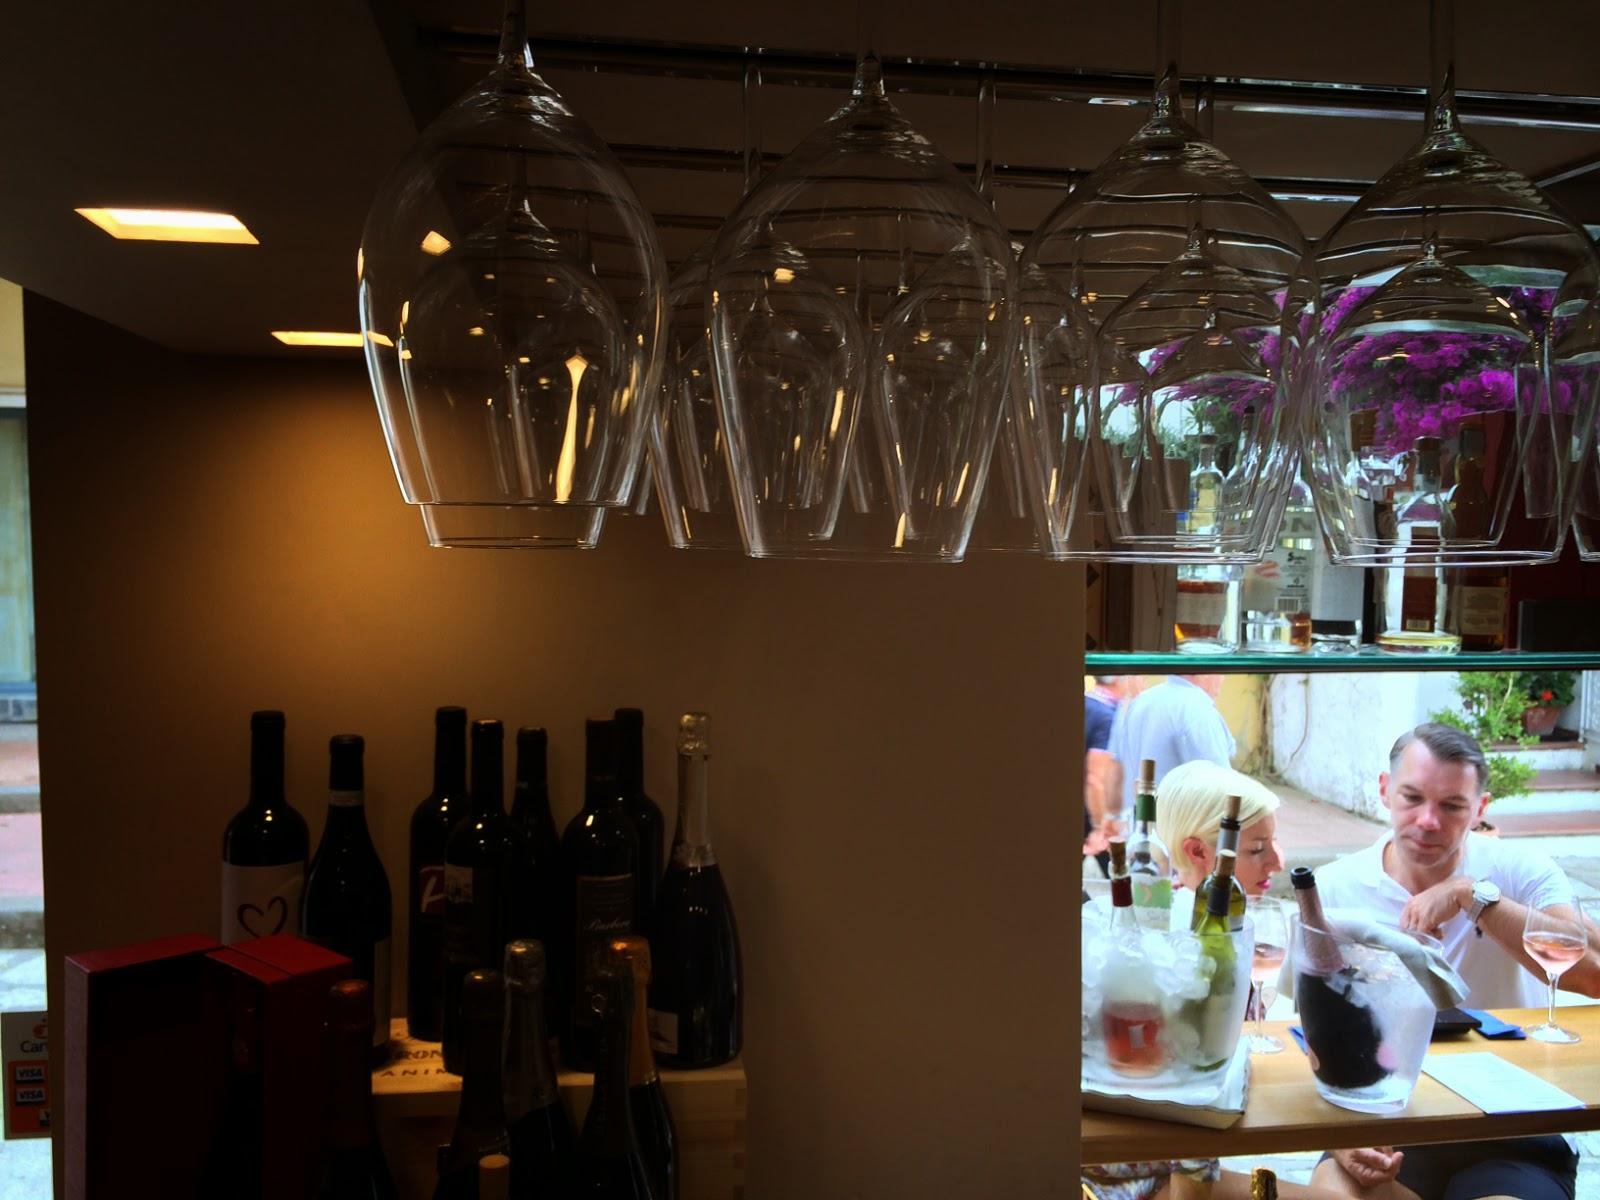 zagara capri wine room